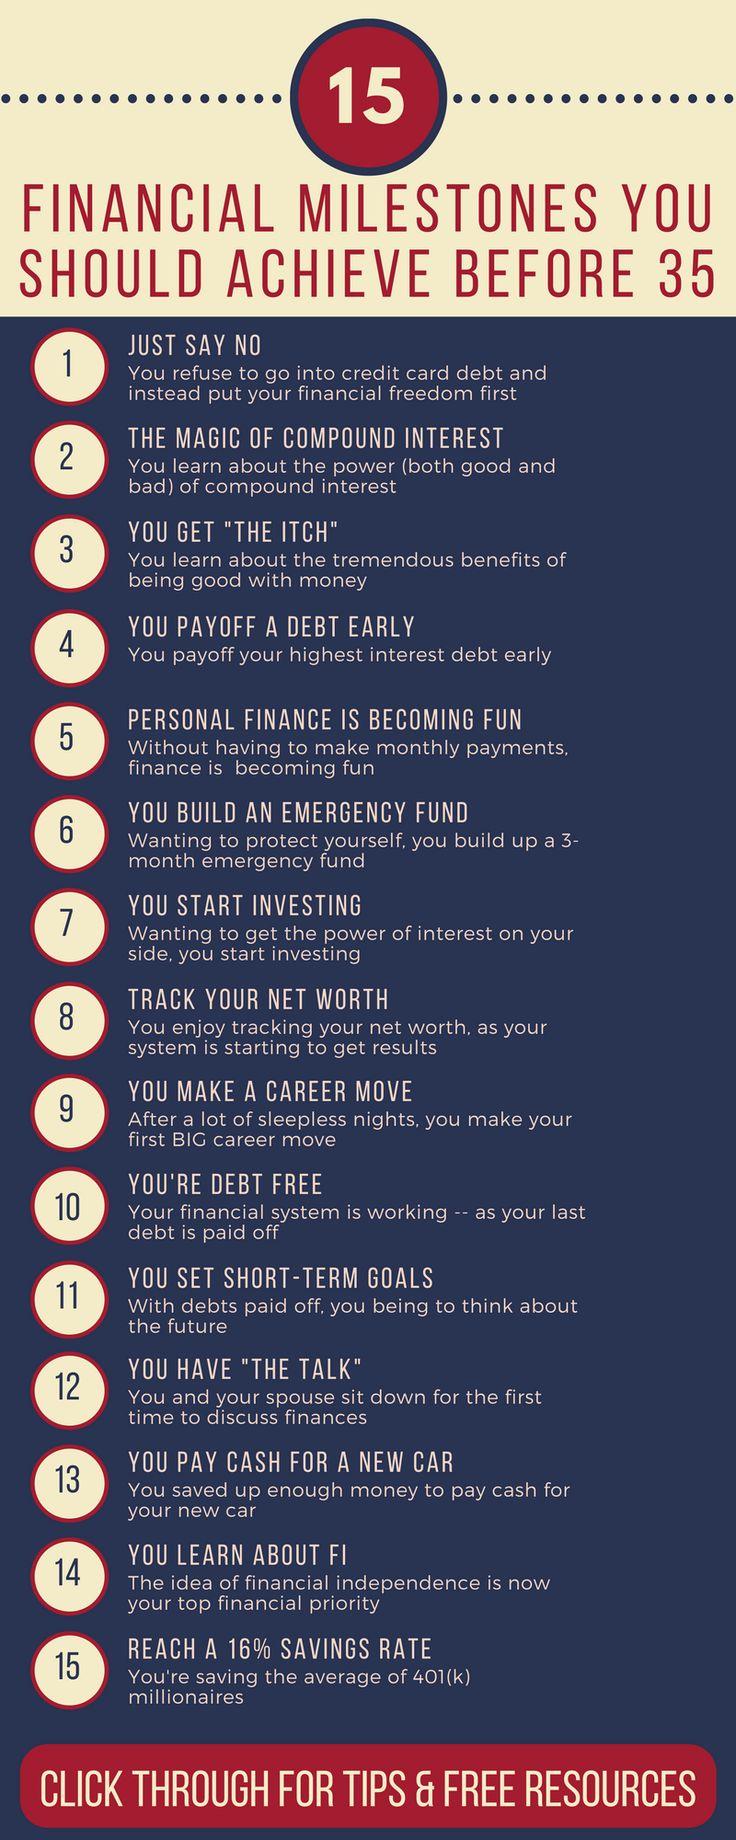 Personal Financial Milestones To Reach Before 35  financial milestones | millennial money tips | millennial personal finance | in your 20s advice | in your 30s advice  #moneymanagement #personalfinance #millennials via @https://www.pinterest.com/thewaystowealth/